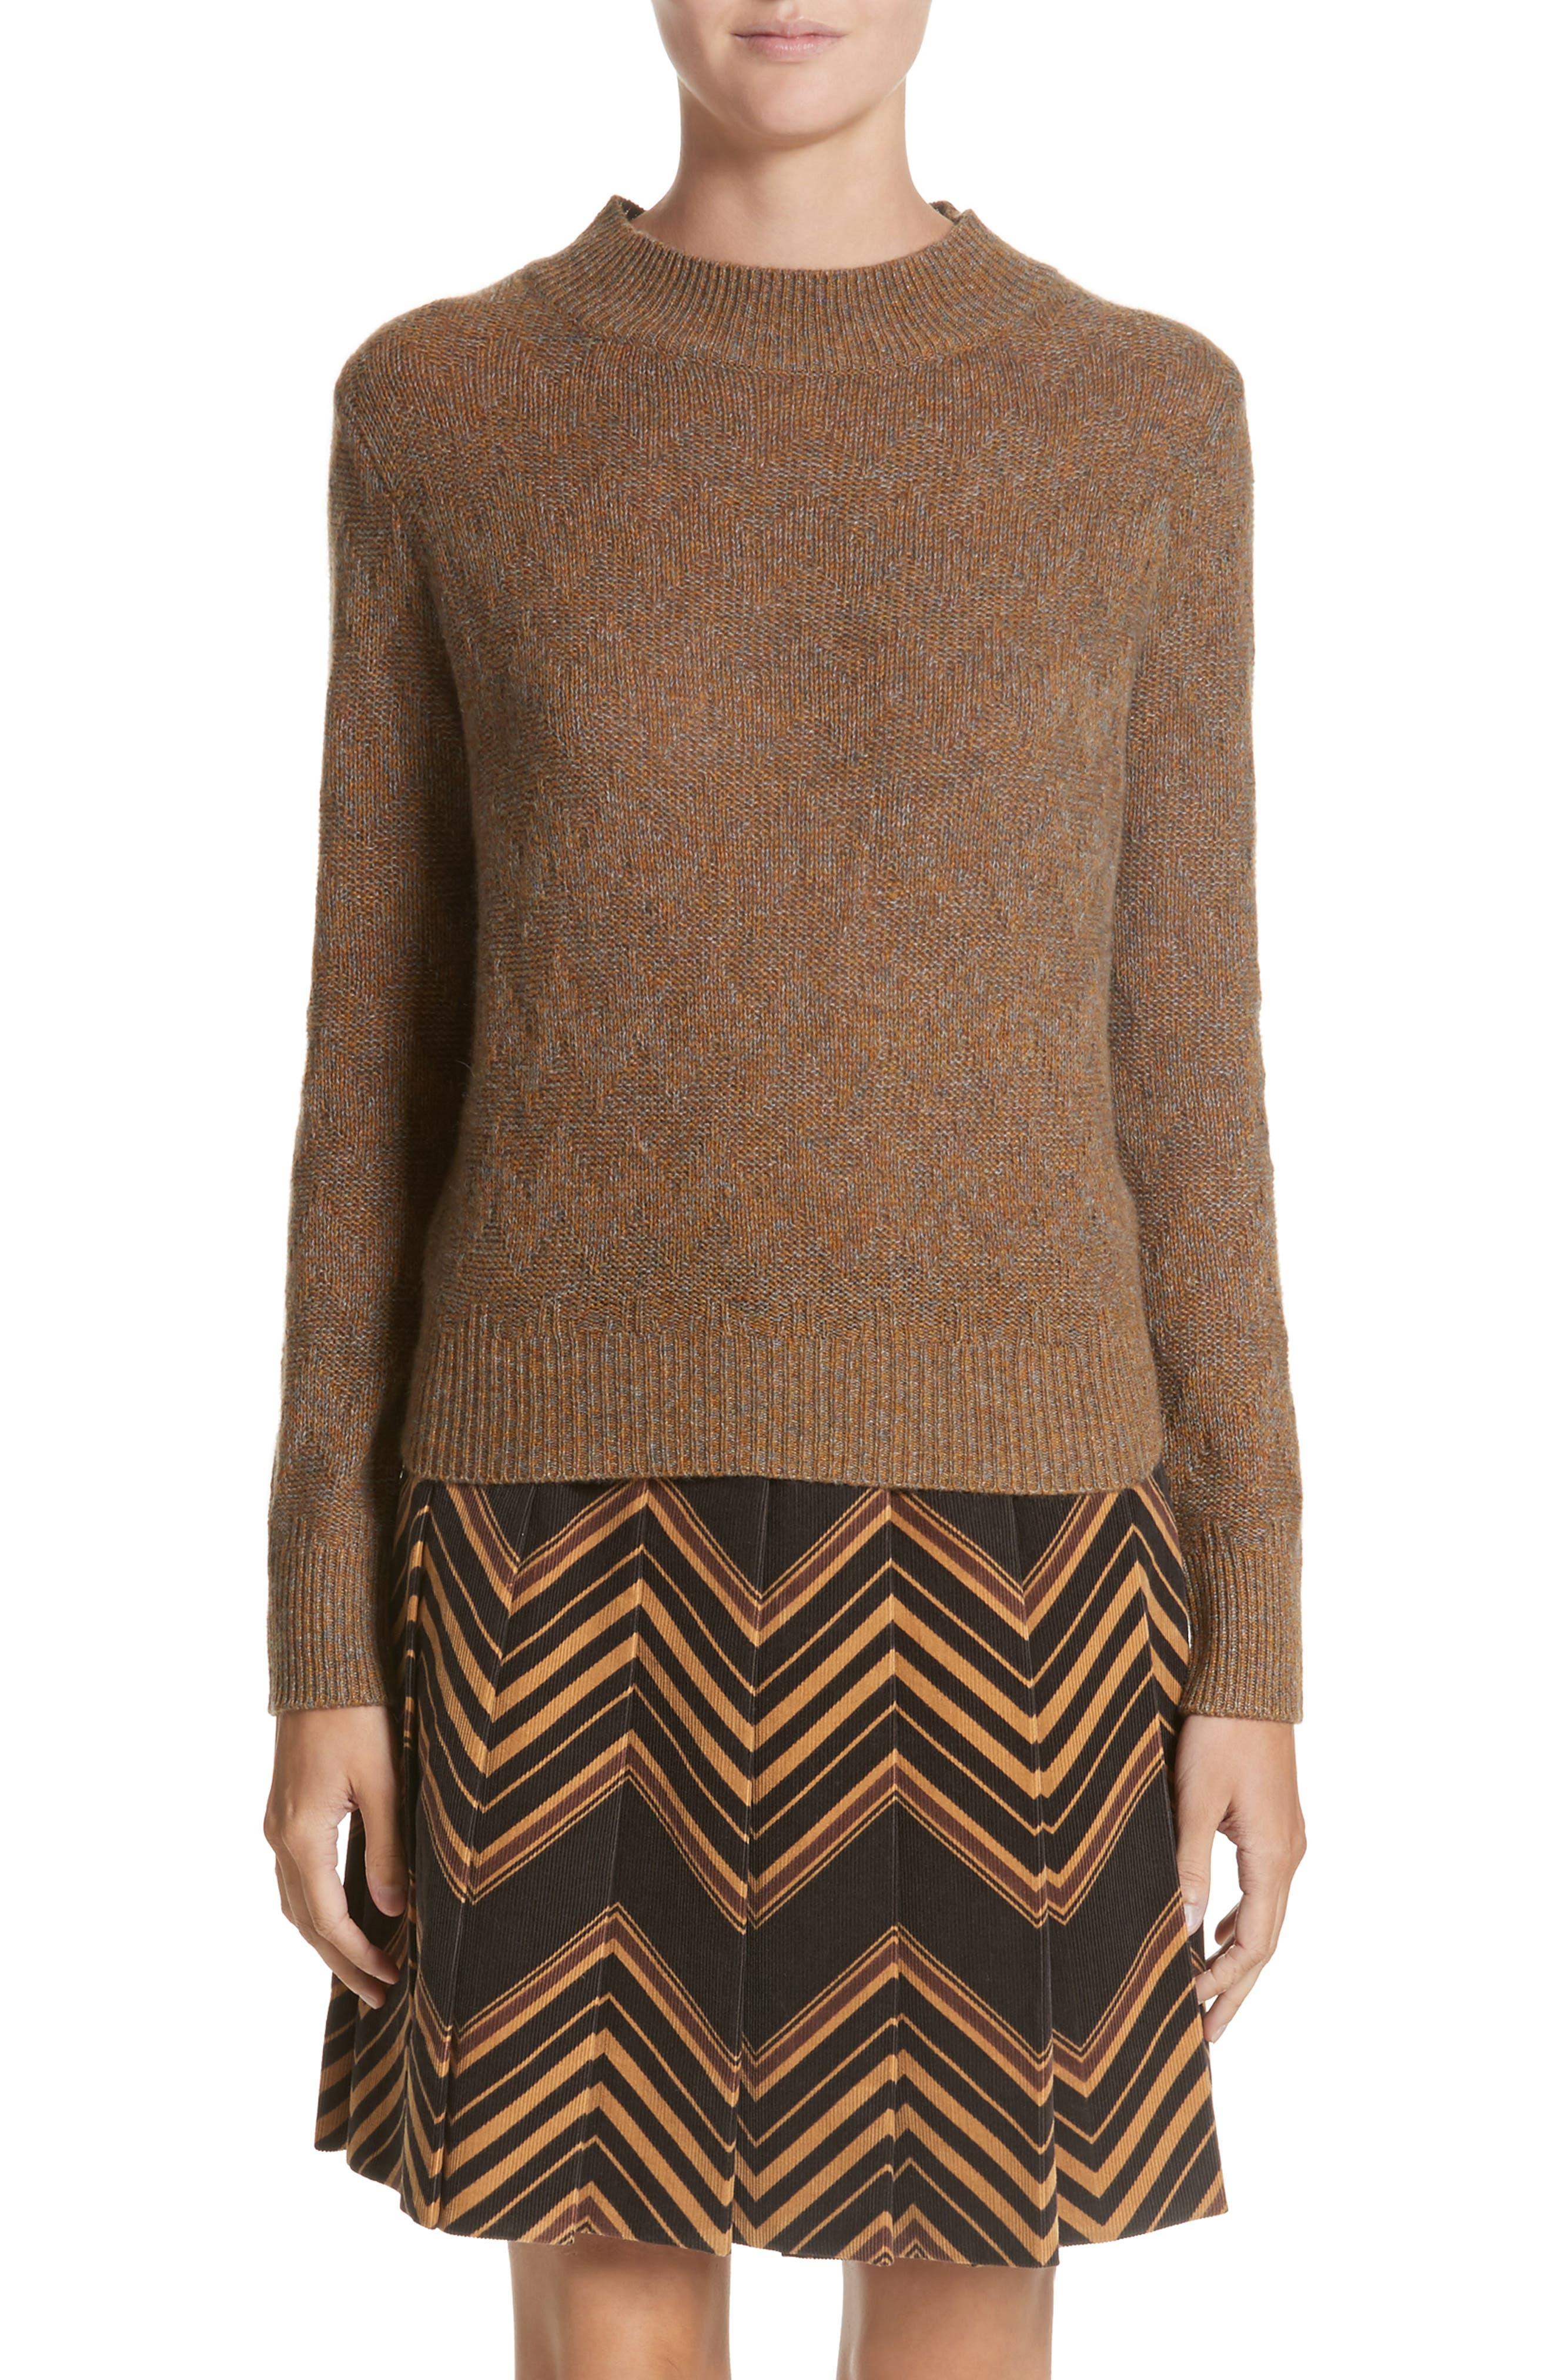 Main Image - MARC JACOBS Chevron Knit Cashmere Sweater